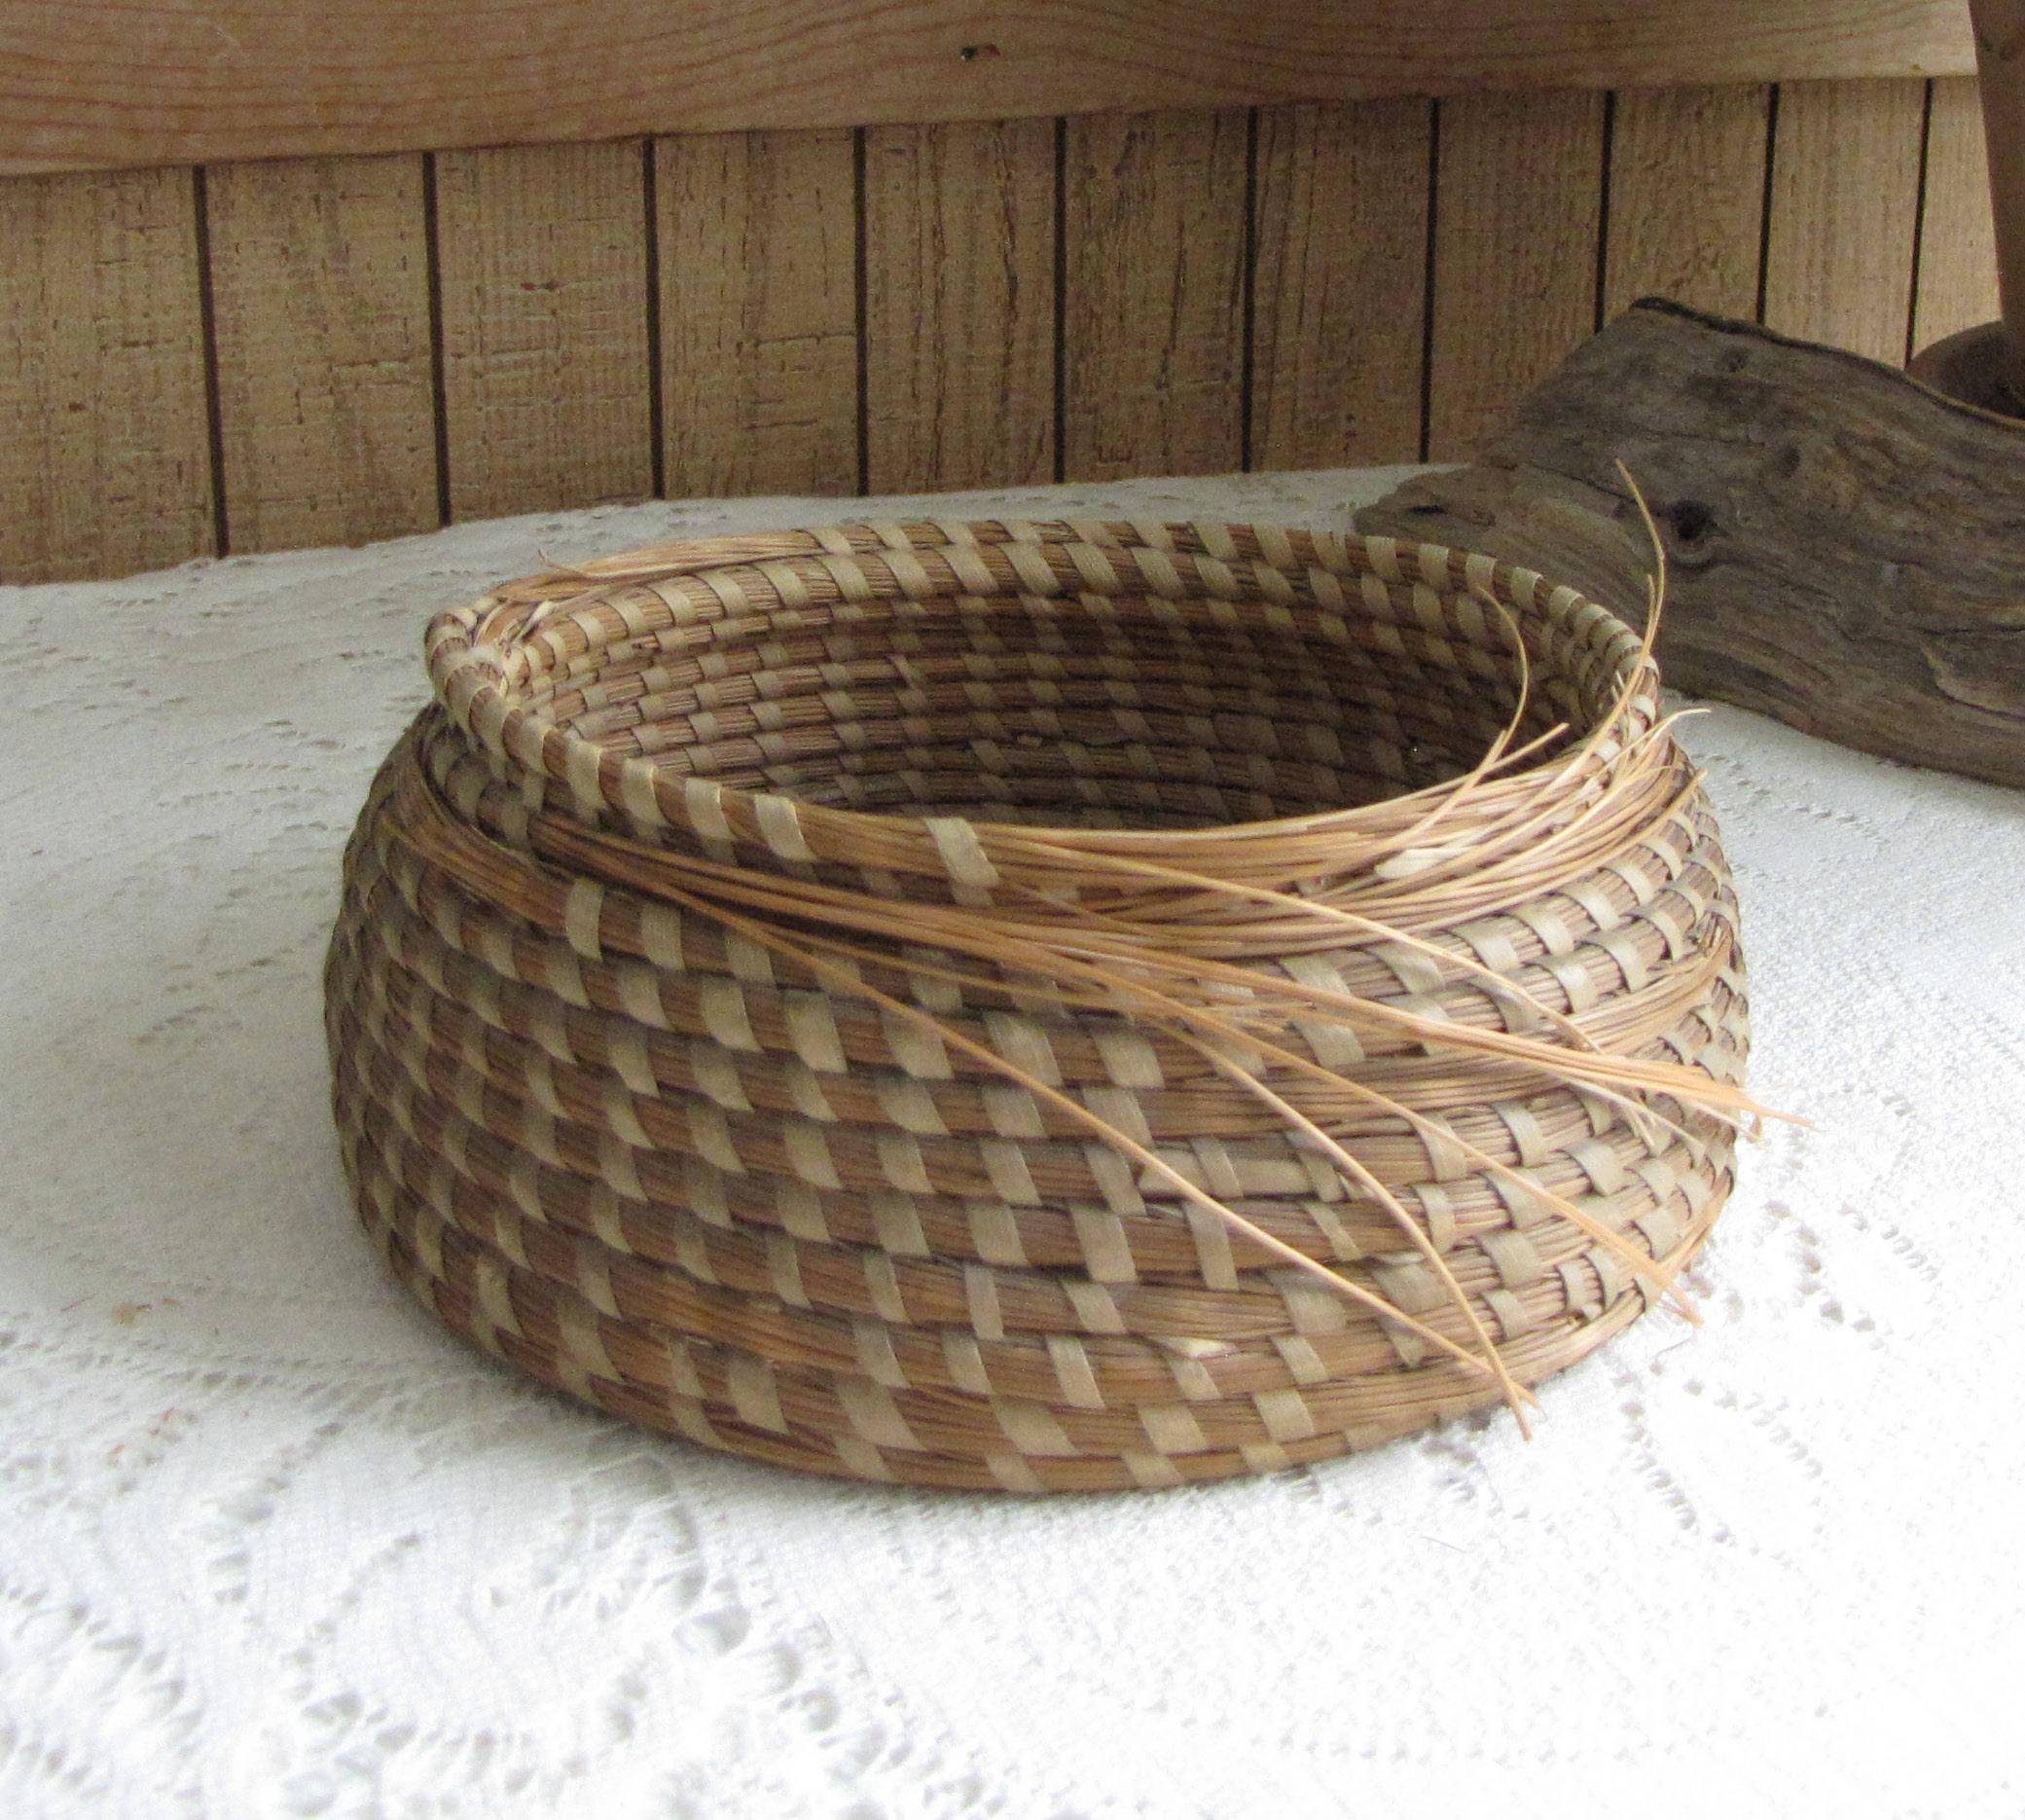 Hand Woven Basket Unfinished Garden Trug Vintage Storage and Gardens ...